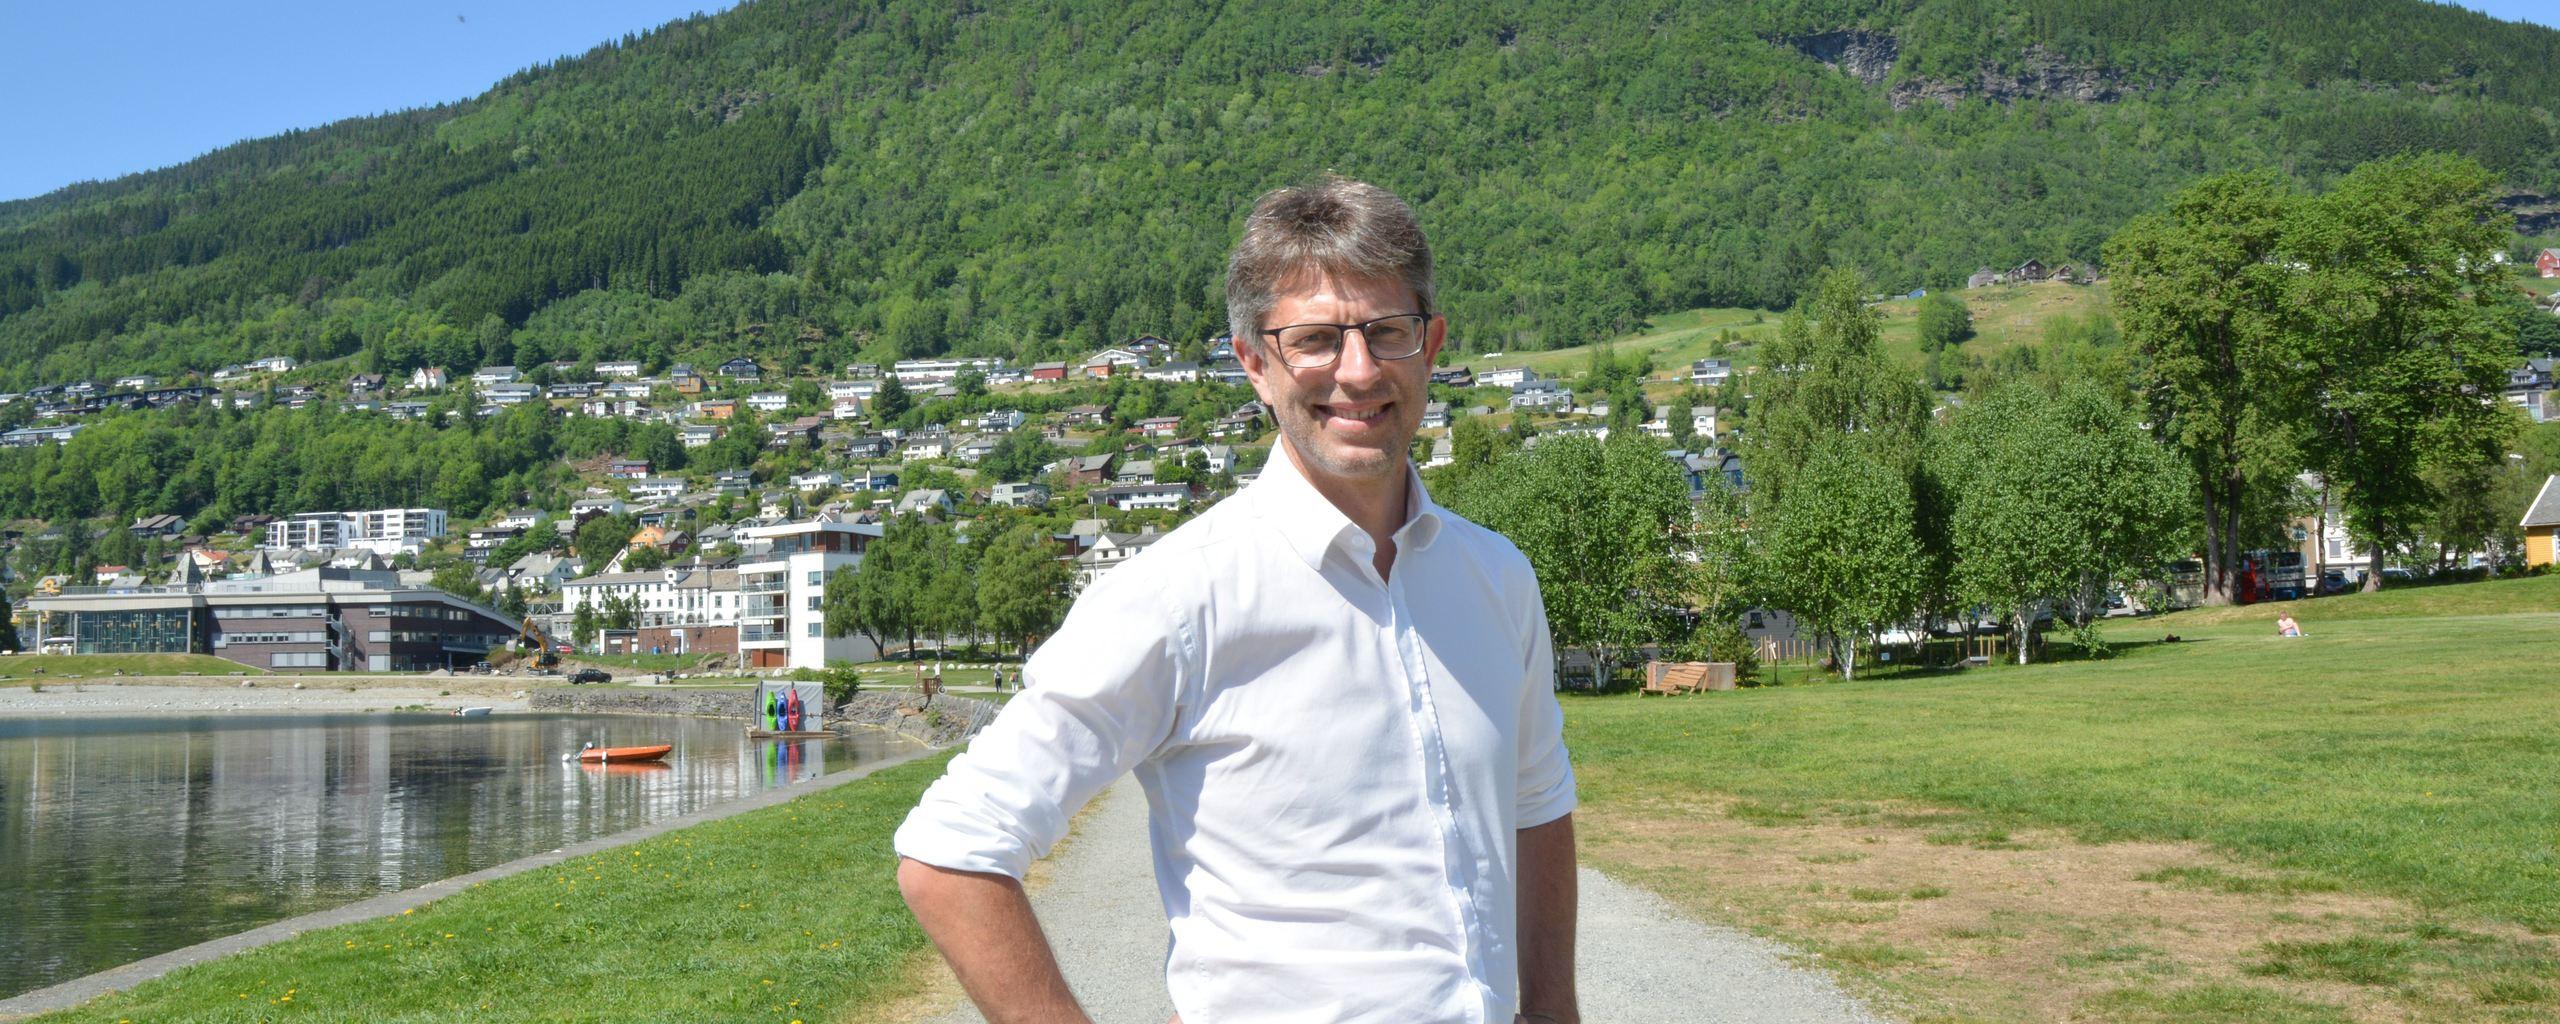 Ordførar Hans-Erik Ringkjøb